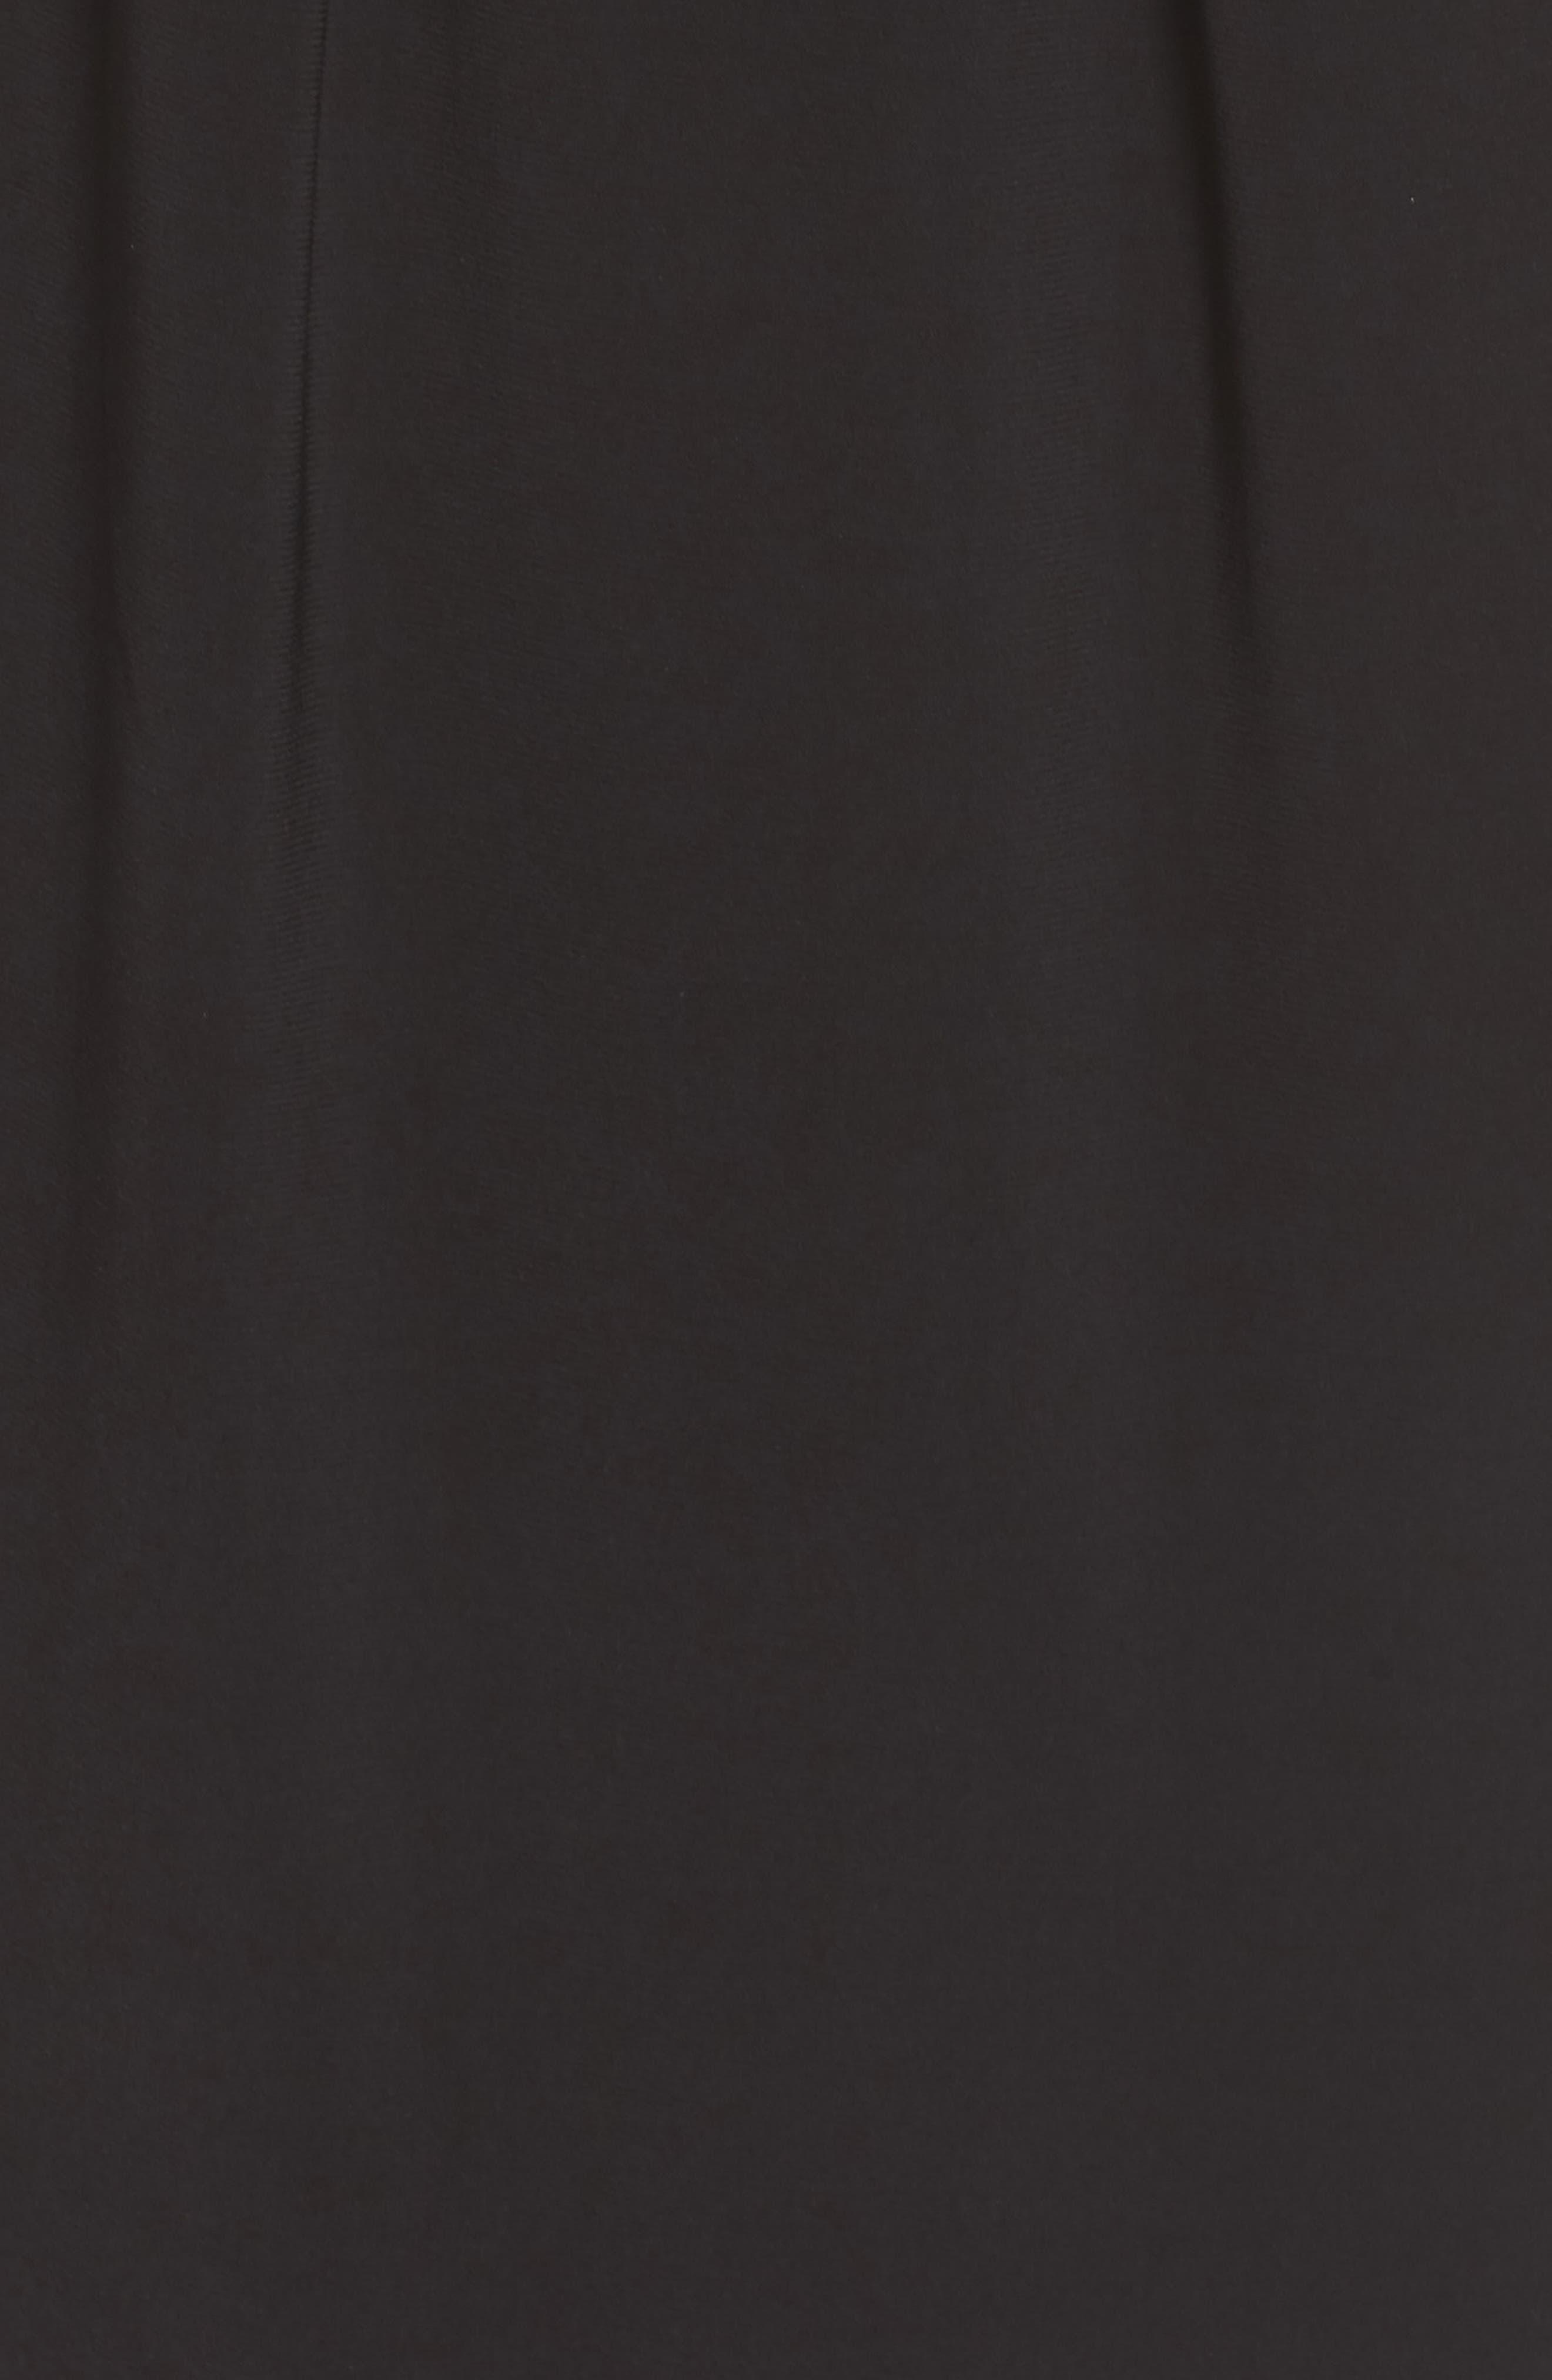 Matte Jersey Sheath Dress,                             Alternate thumbnail 6, color,                             Black